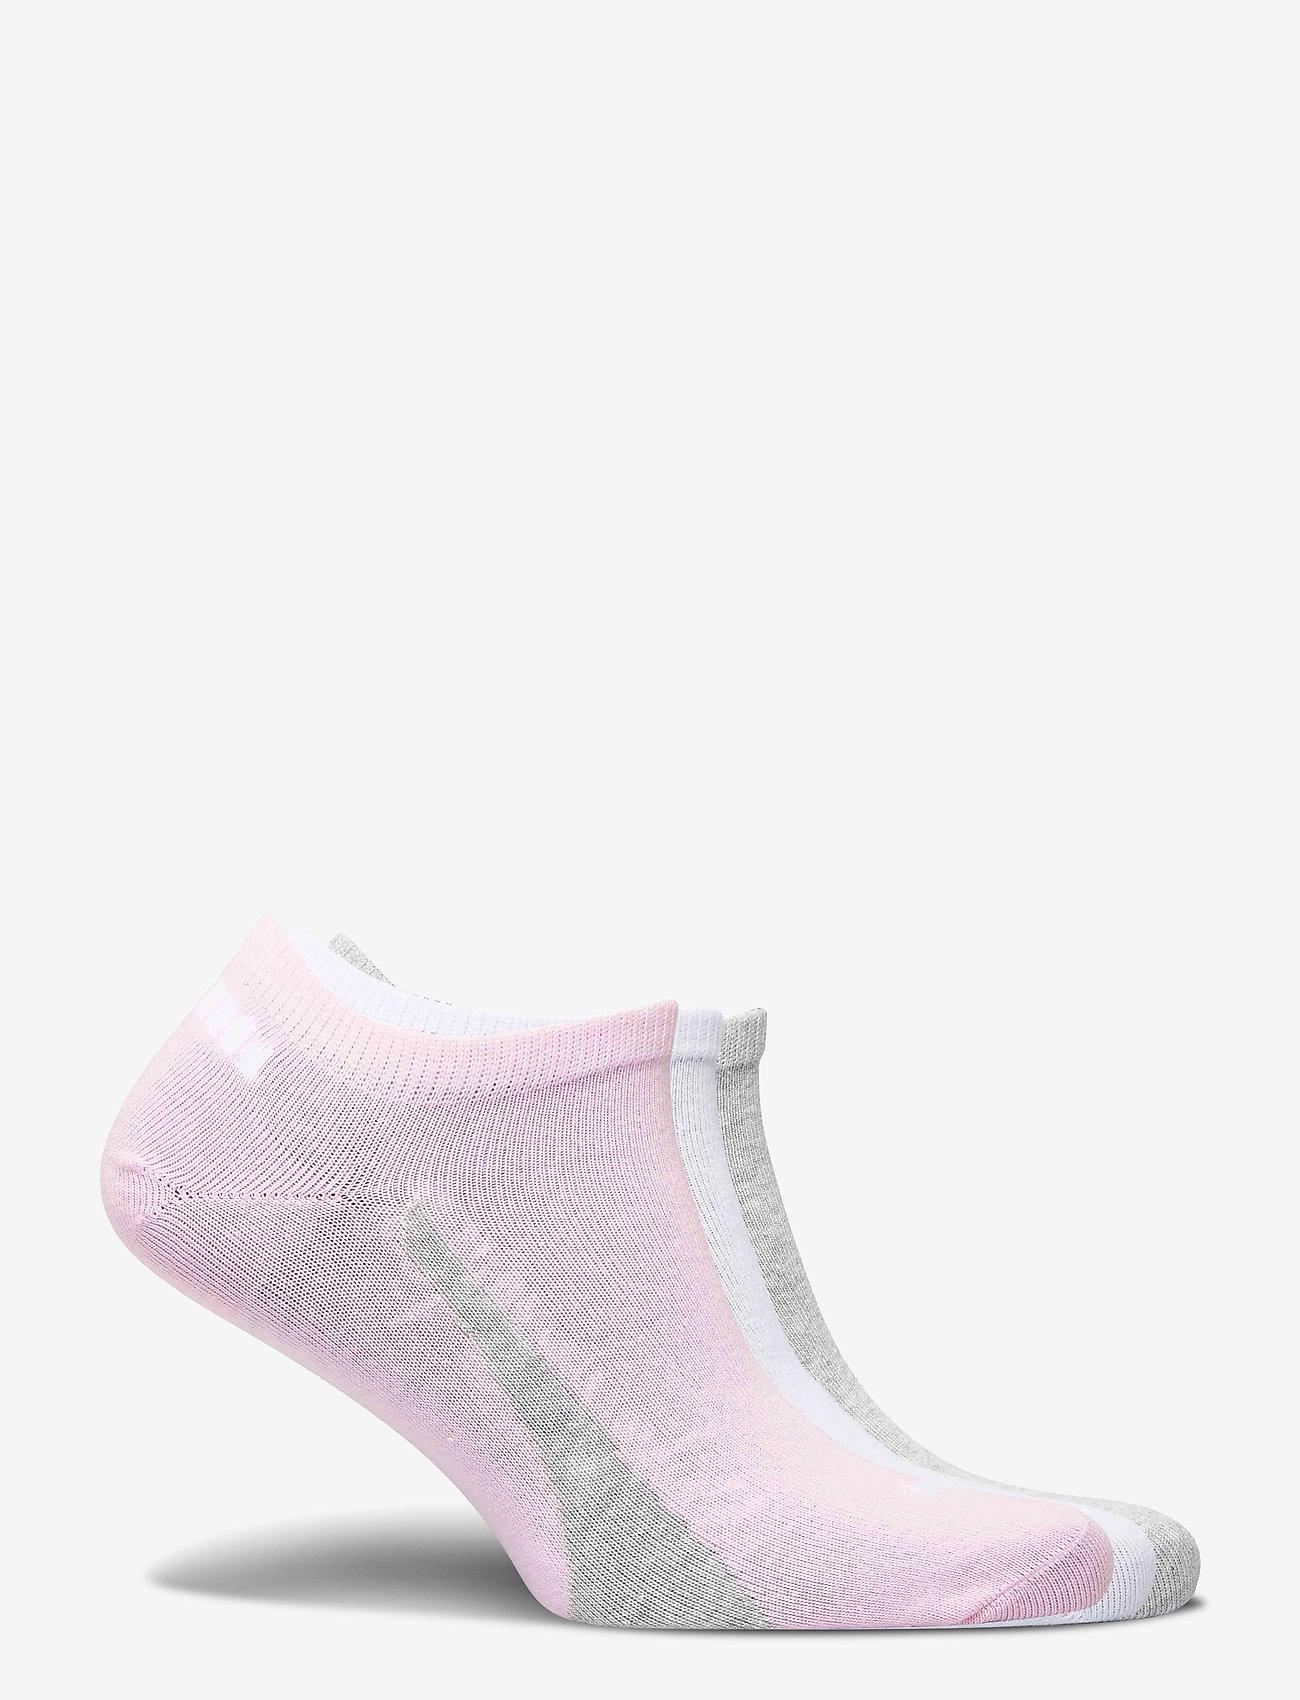 PUMA - PUMA UNISEX LIFESTYLE SNEAKERS 3P - ankelstrumpor - basic pink - 1